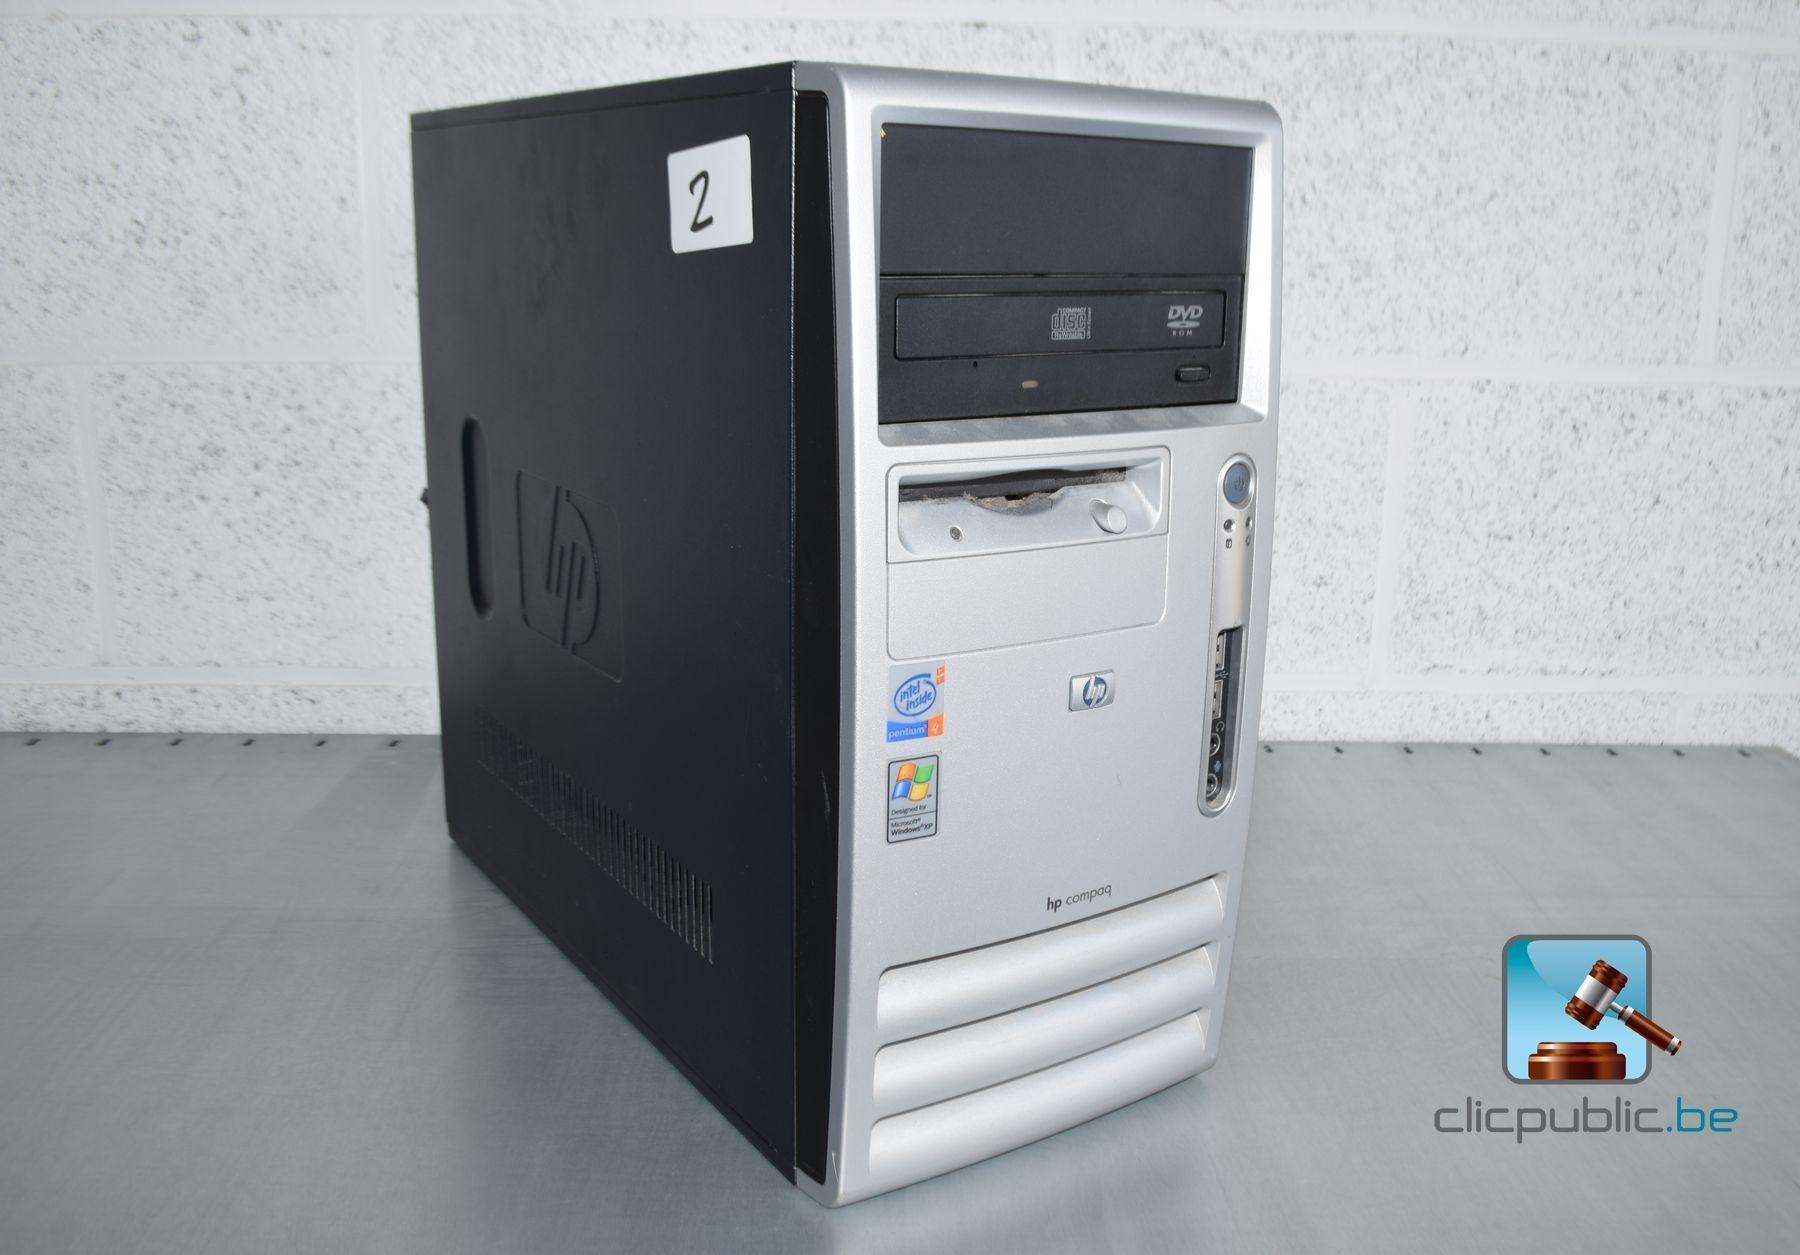 ordinateur de bureau hp compaq d330 u f p2 ref 2 vendre sur. Black Bedroom Furniture Sets. Home Design Ideas